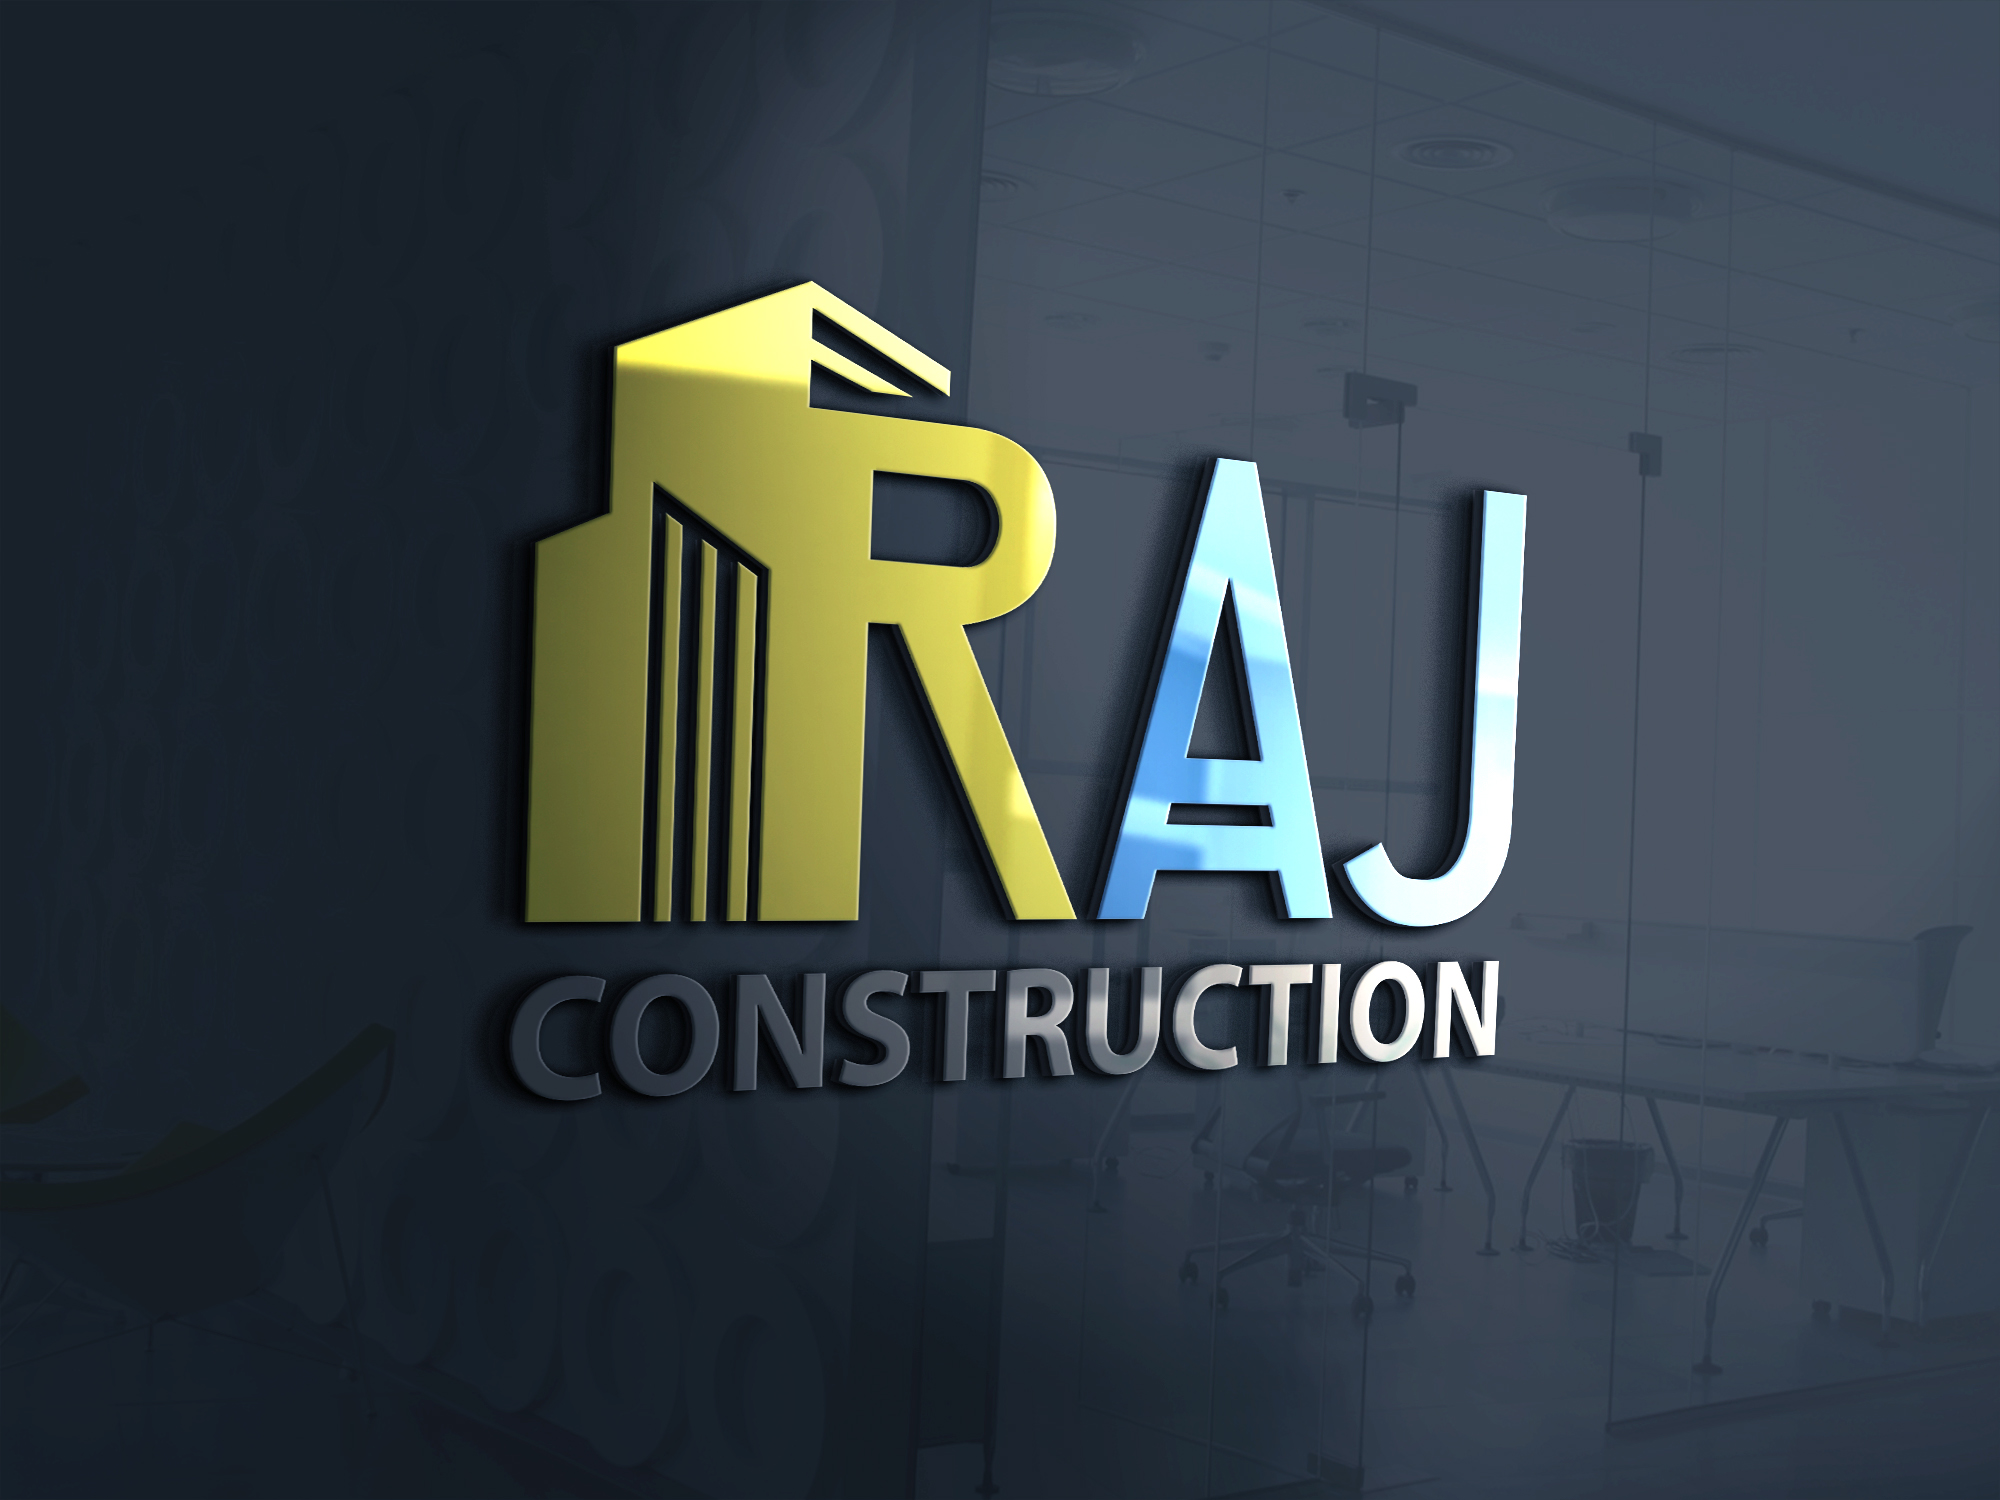 Raj contraction company logo design by Badri Design